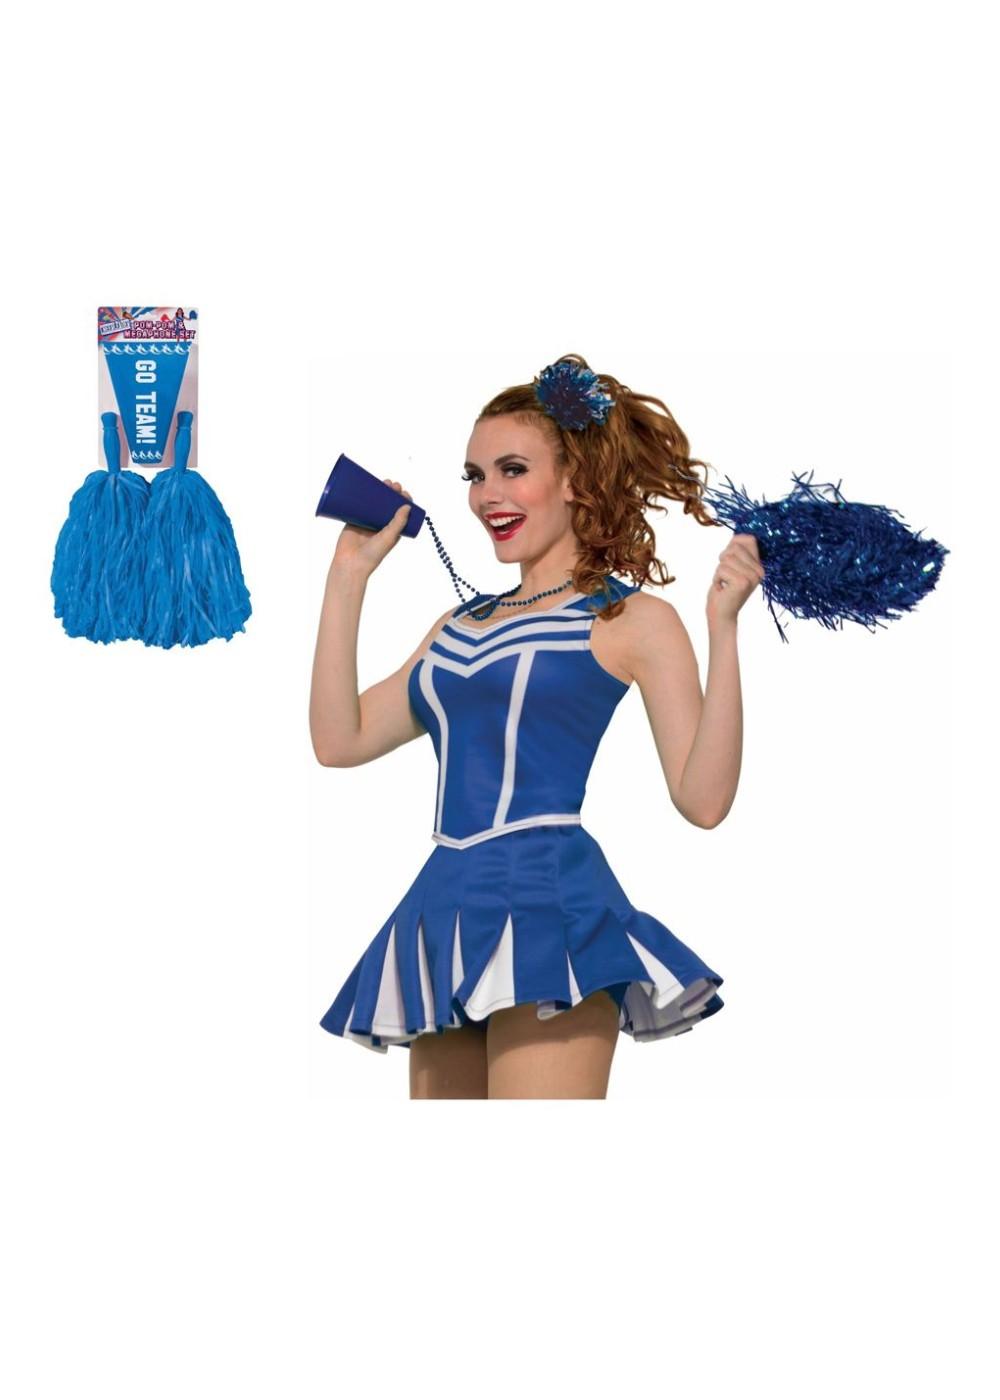 Blue Cheerleader Women Costume Set Sports Costumes